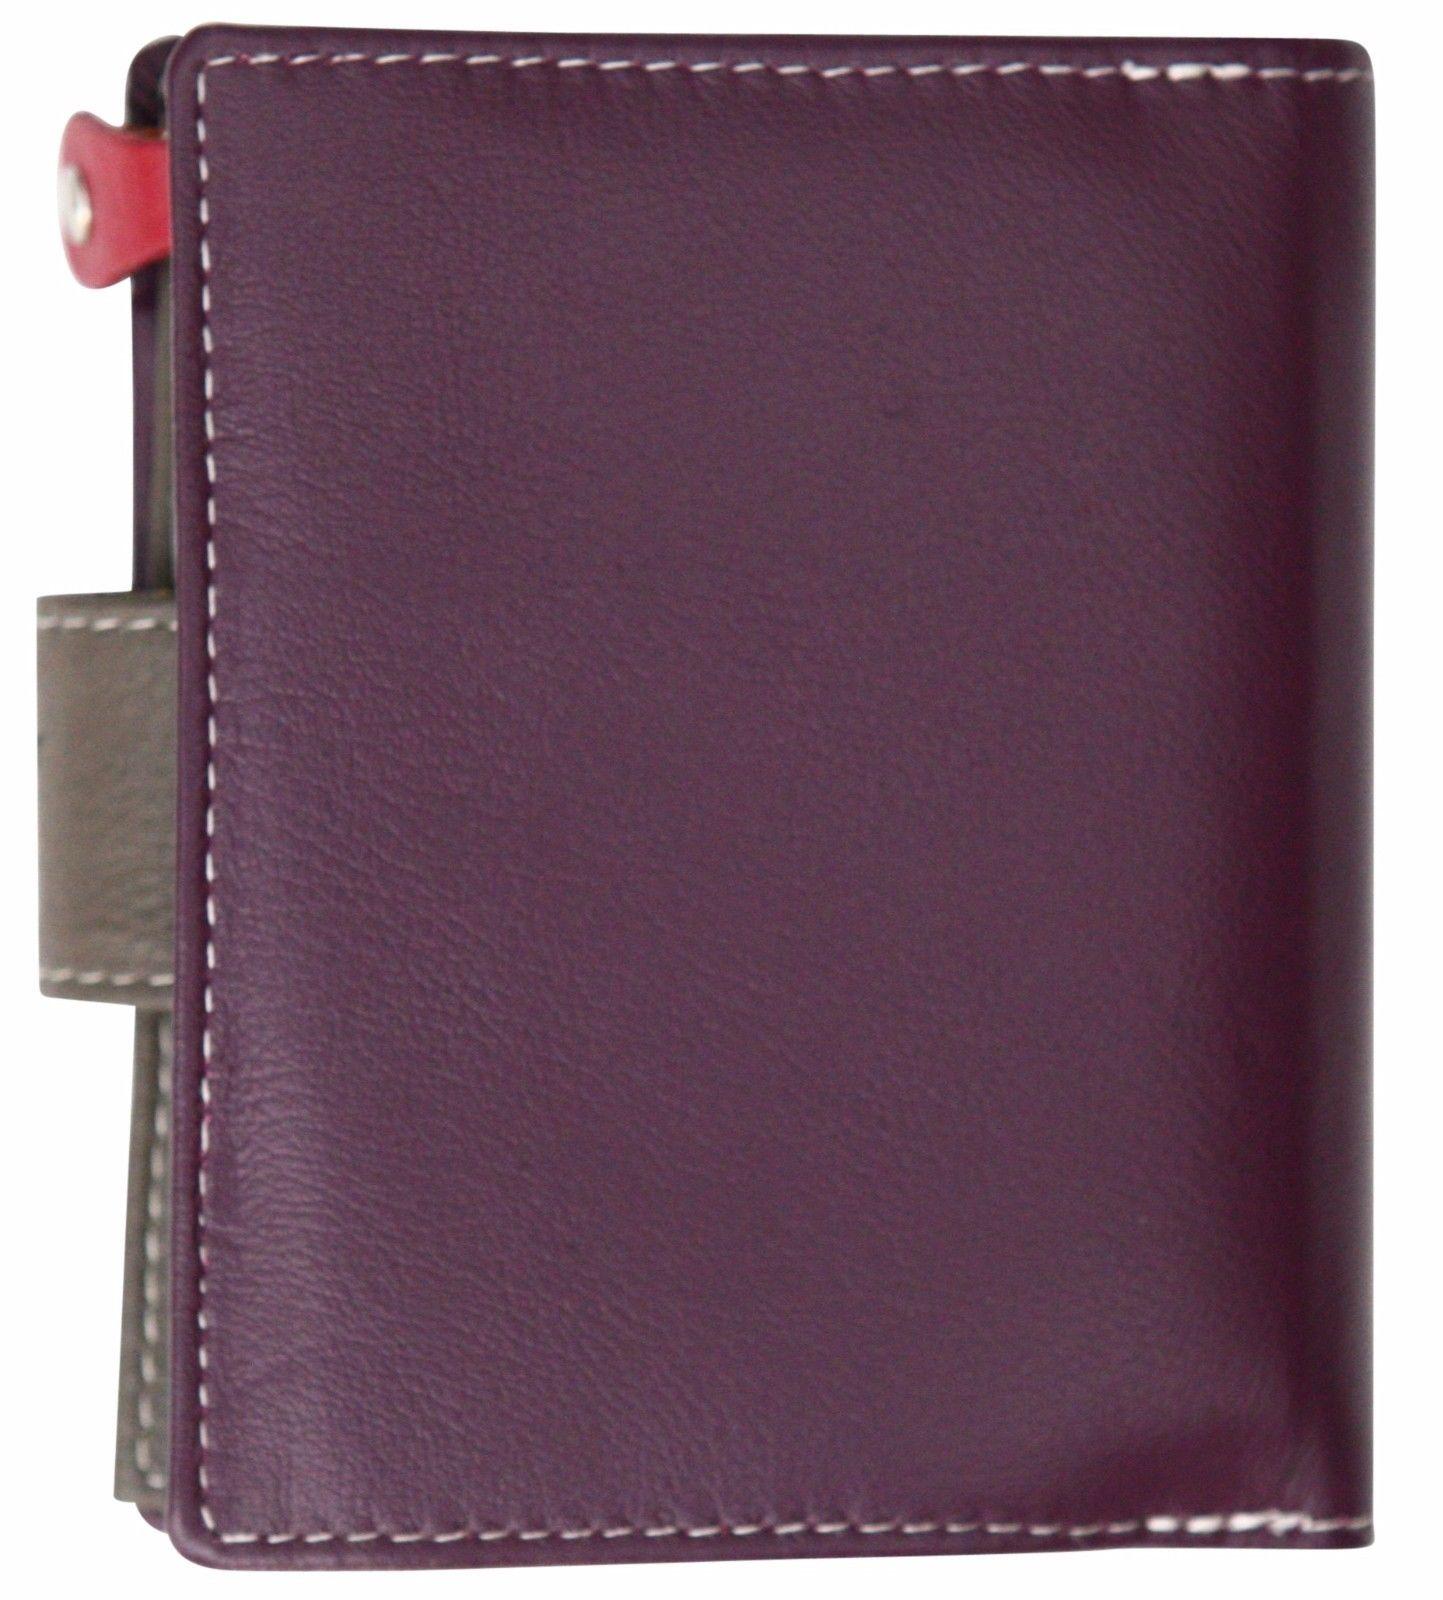 Felda-RFID-onorevoli-MEDAGLIA-amp-Card-Purse-Wallet-Genuine-Leather-Multi-SOFT-BOX-REGALO miniatura 97